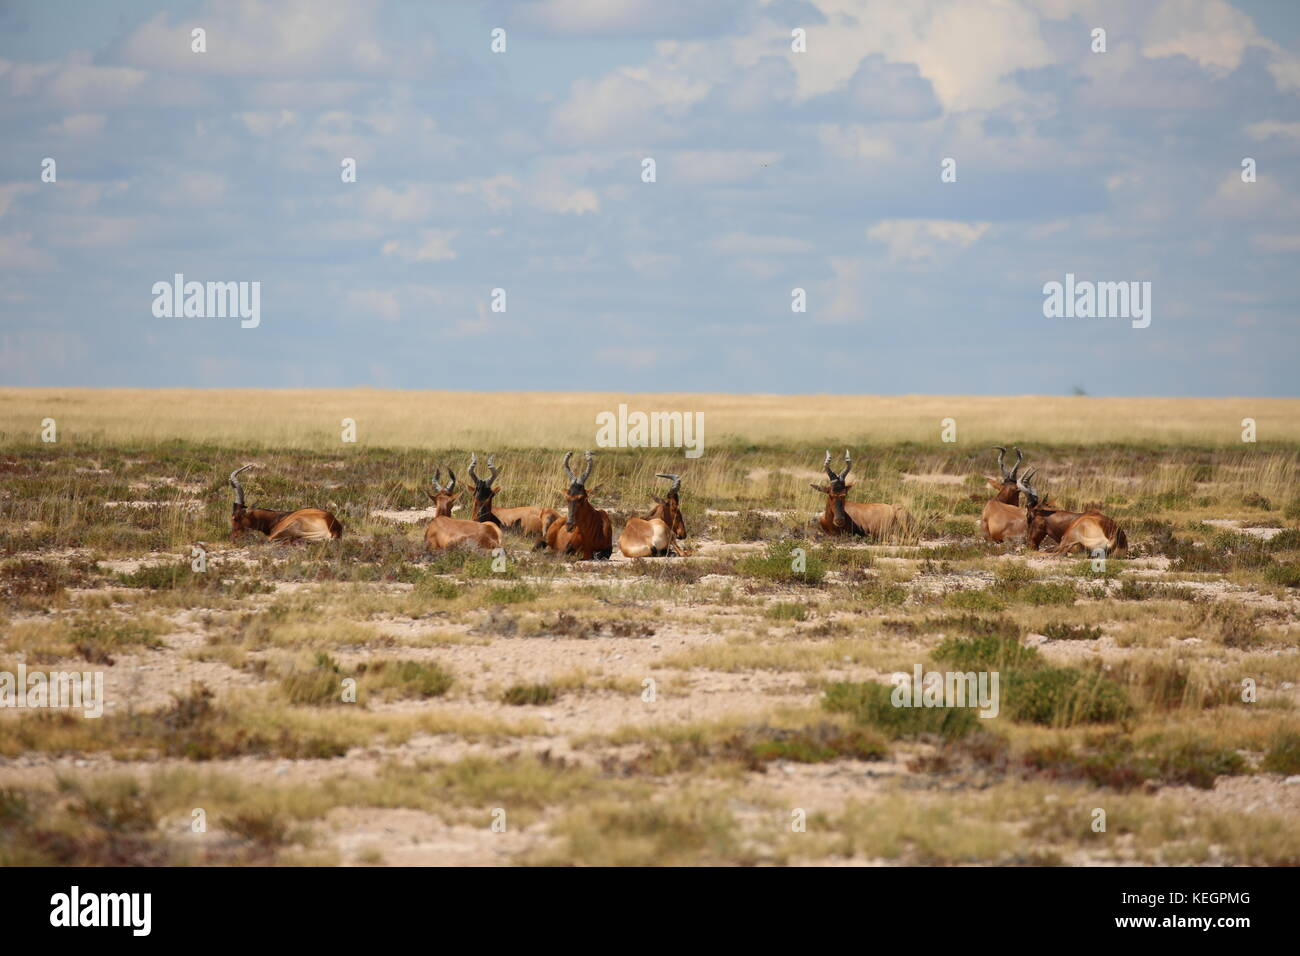 Springbock - Springbok etosha National Park Namibia - Stock Image